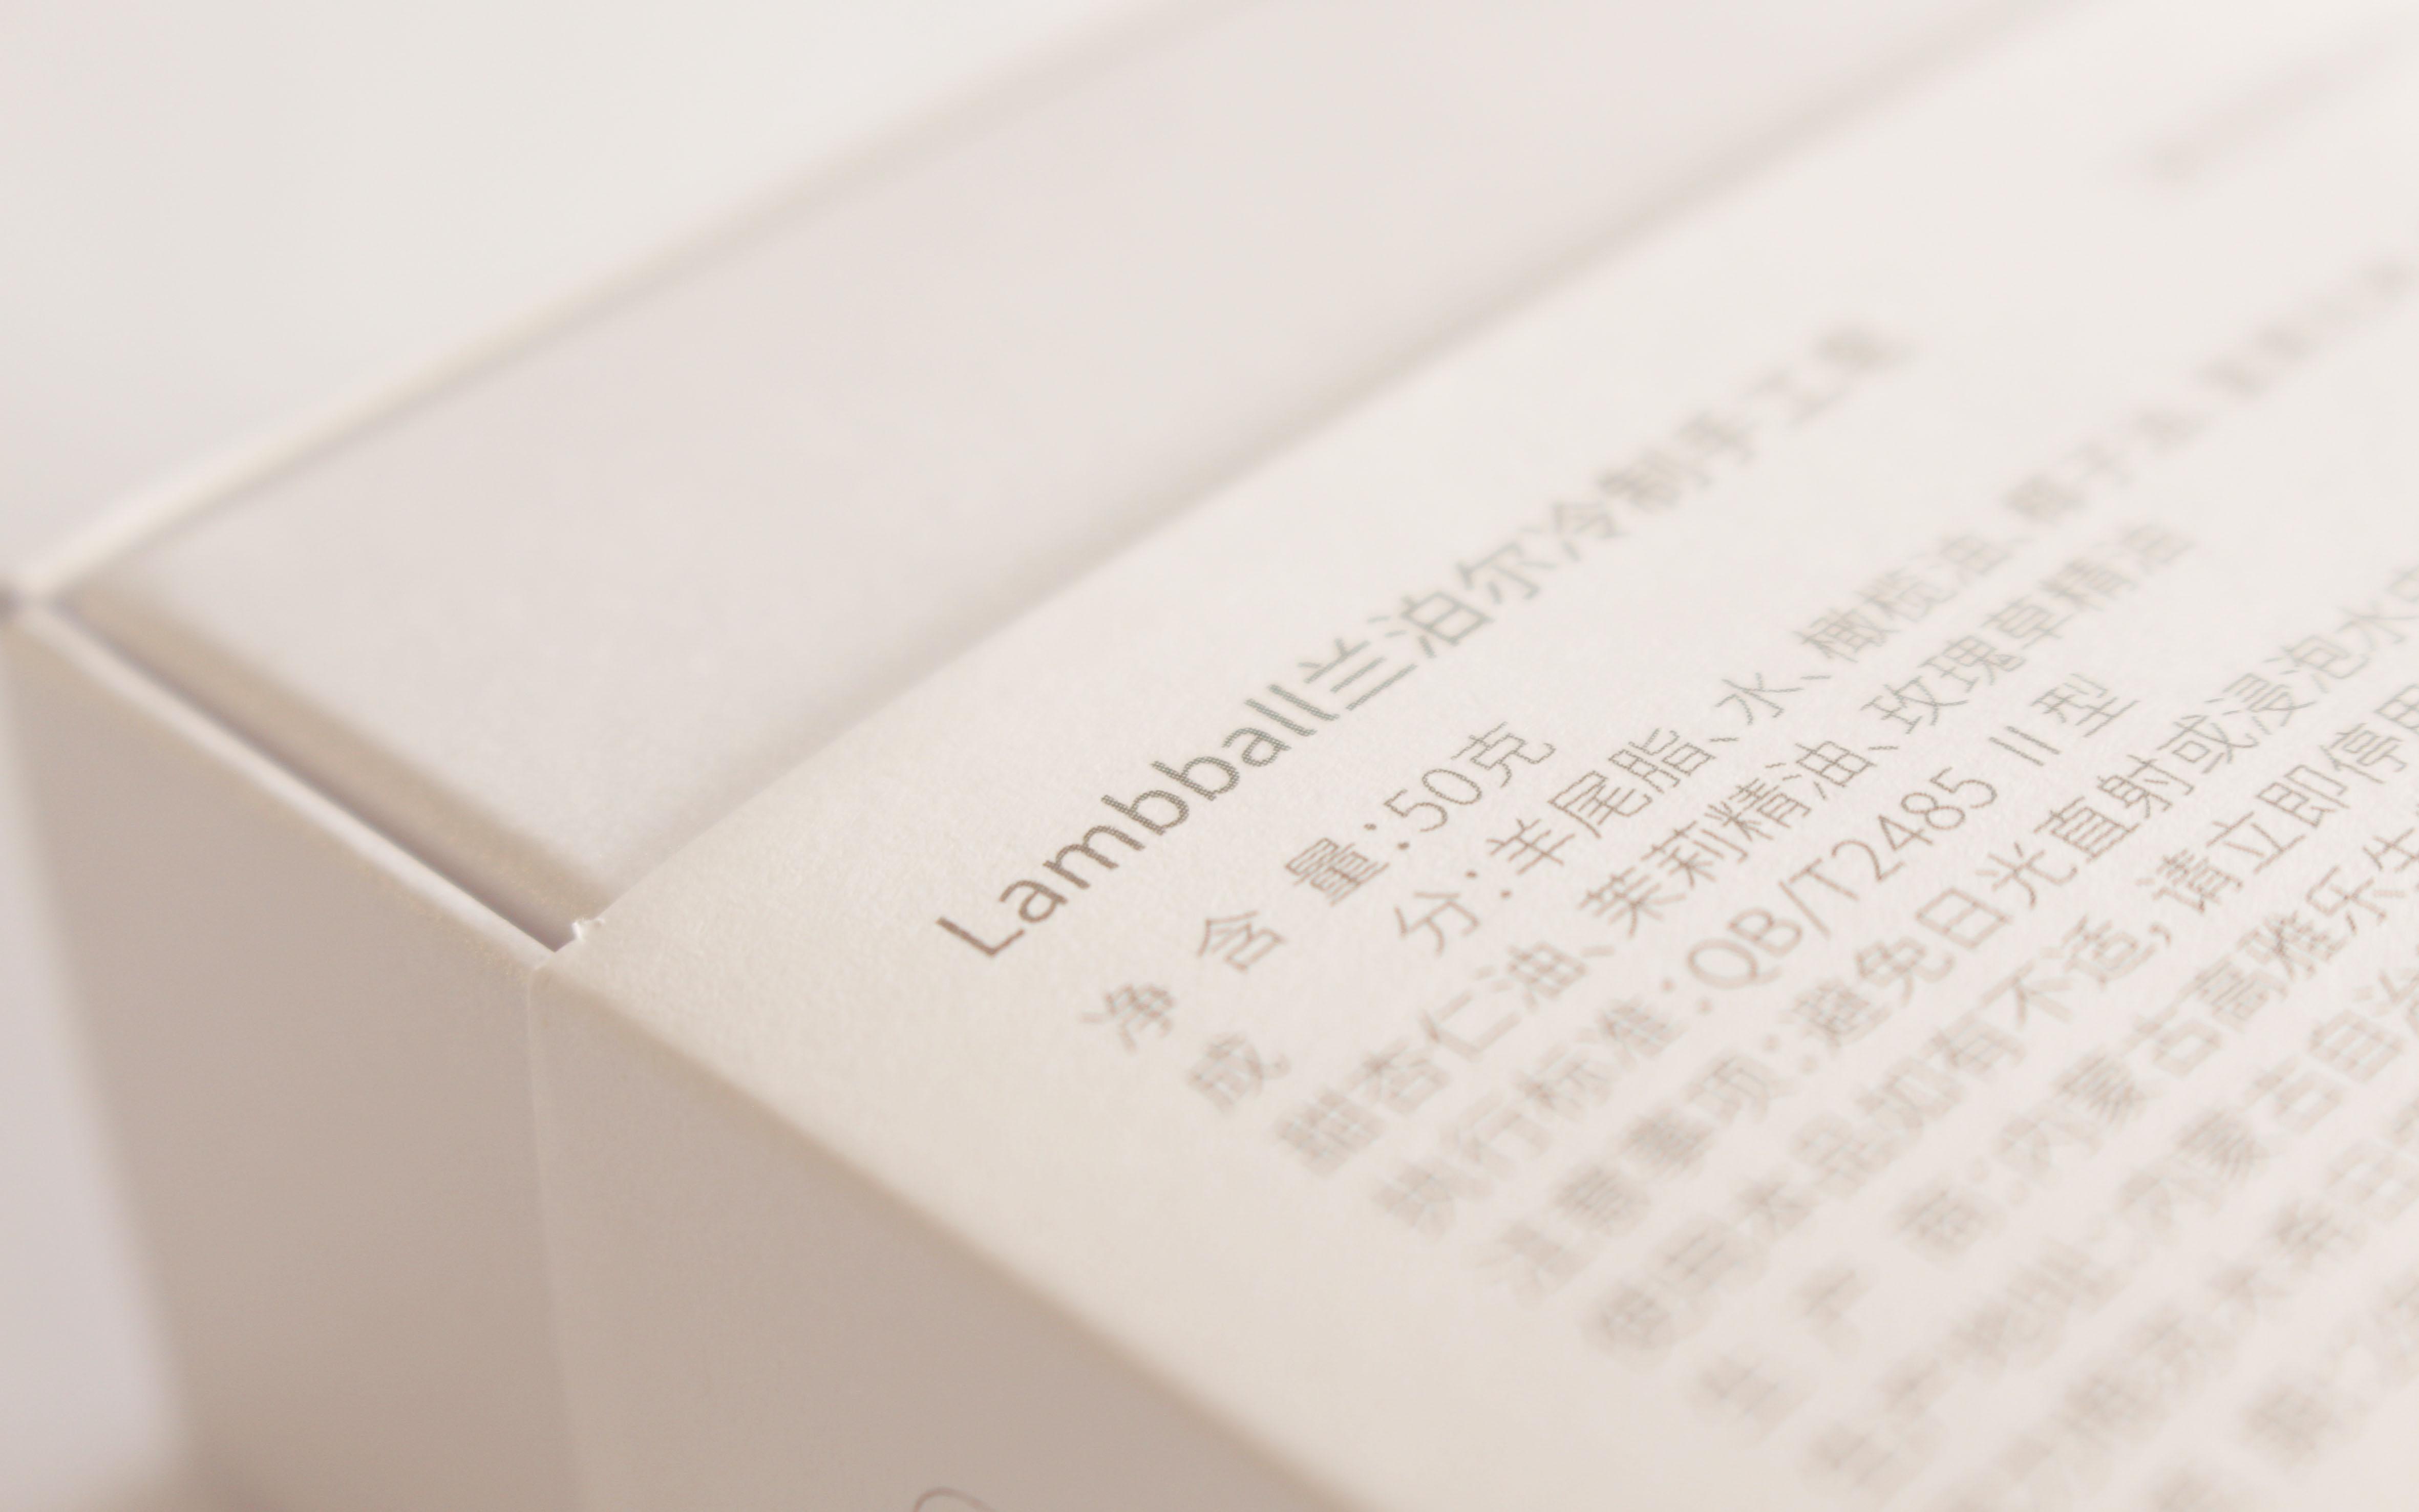 lambball羊脂皂包装设计 第8张 lambball羊脂皂包装设计 蒙古设计